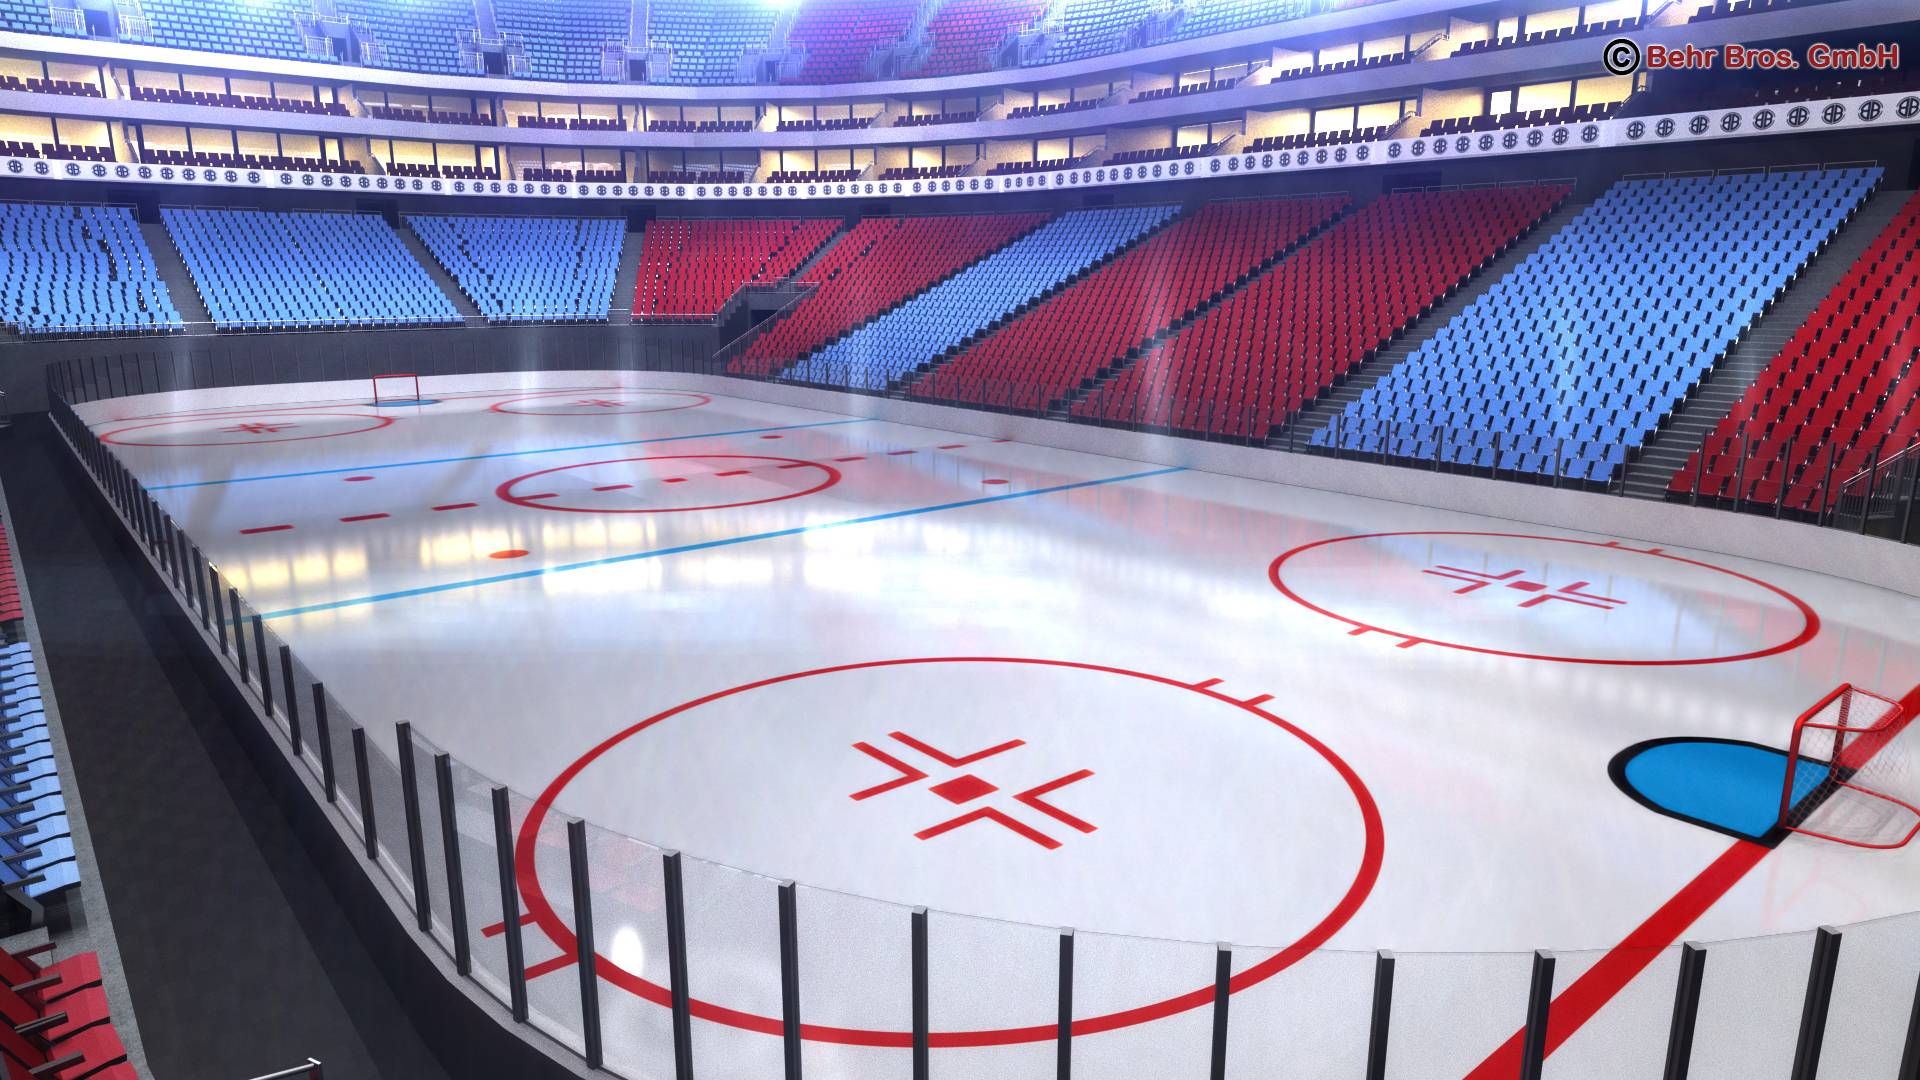 ice hockey arena v2 3d model 3ds max fbx c4d lwo ma mb obj 251654